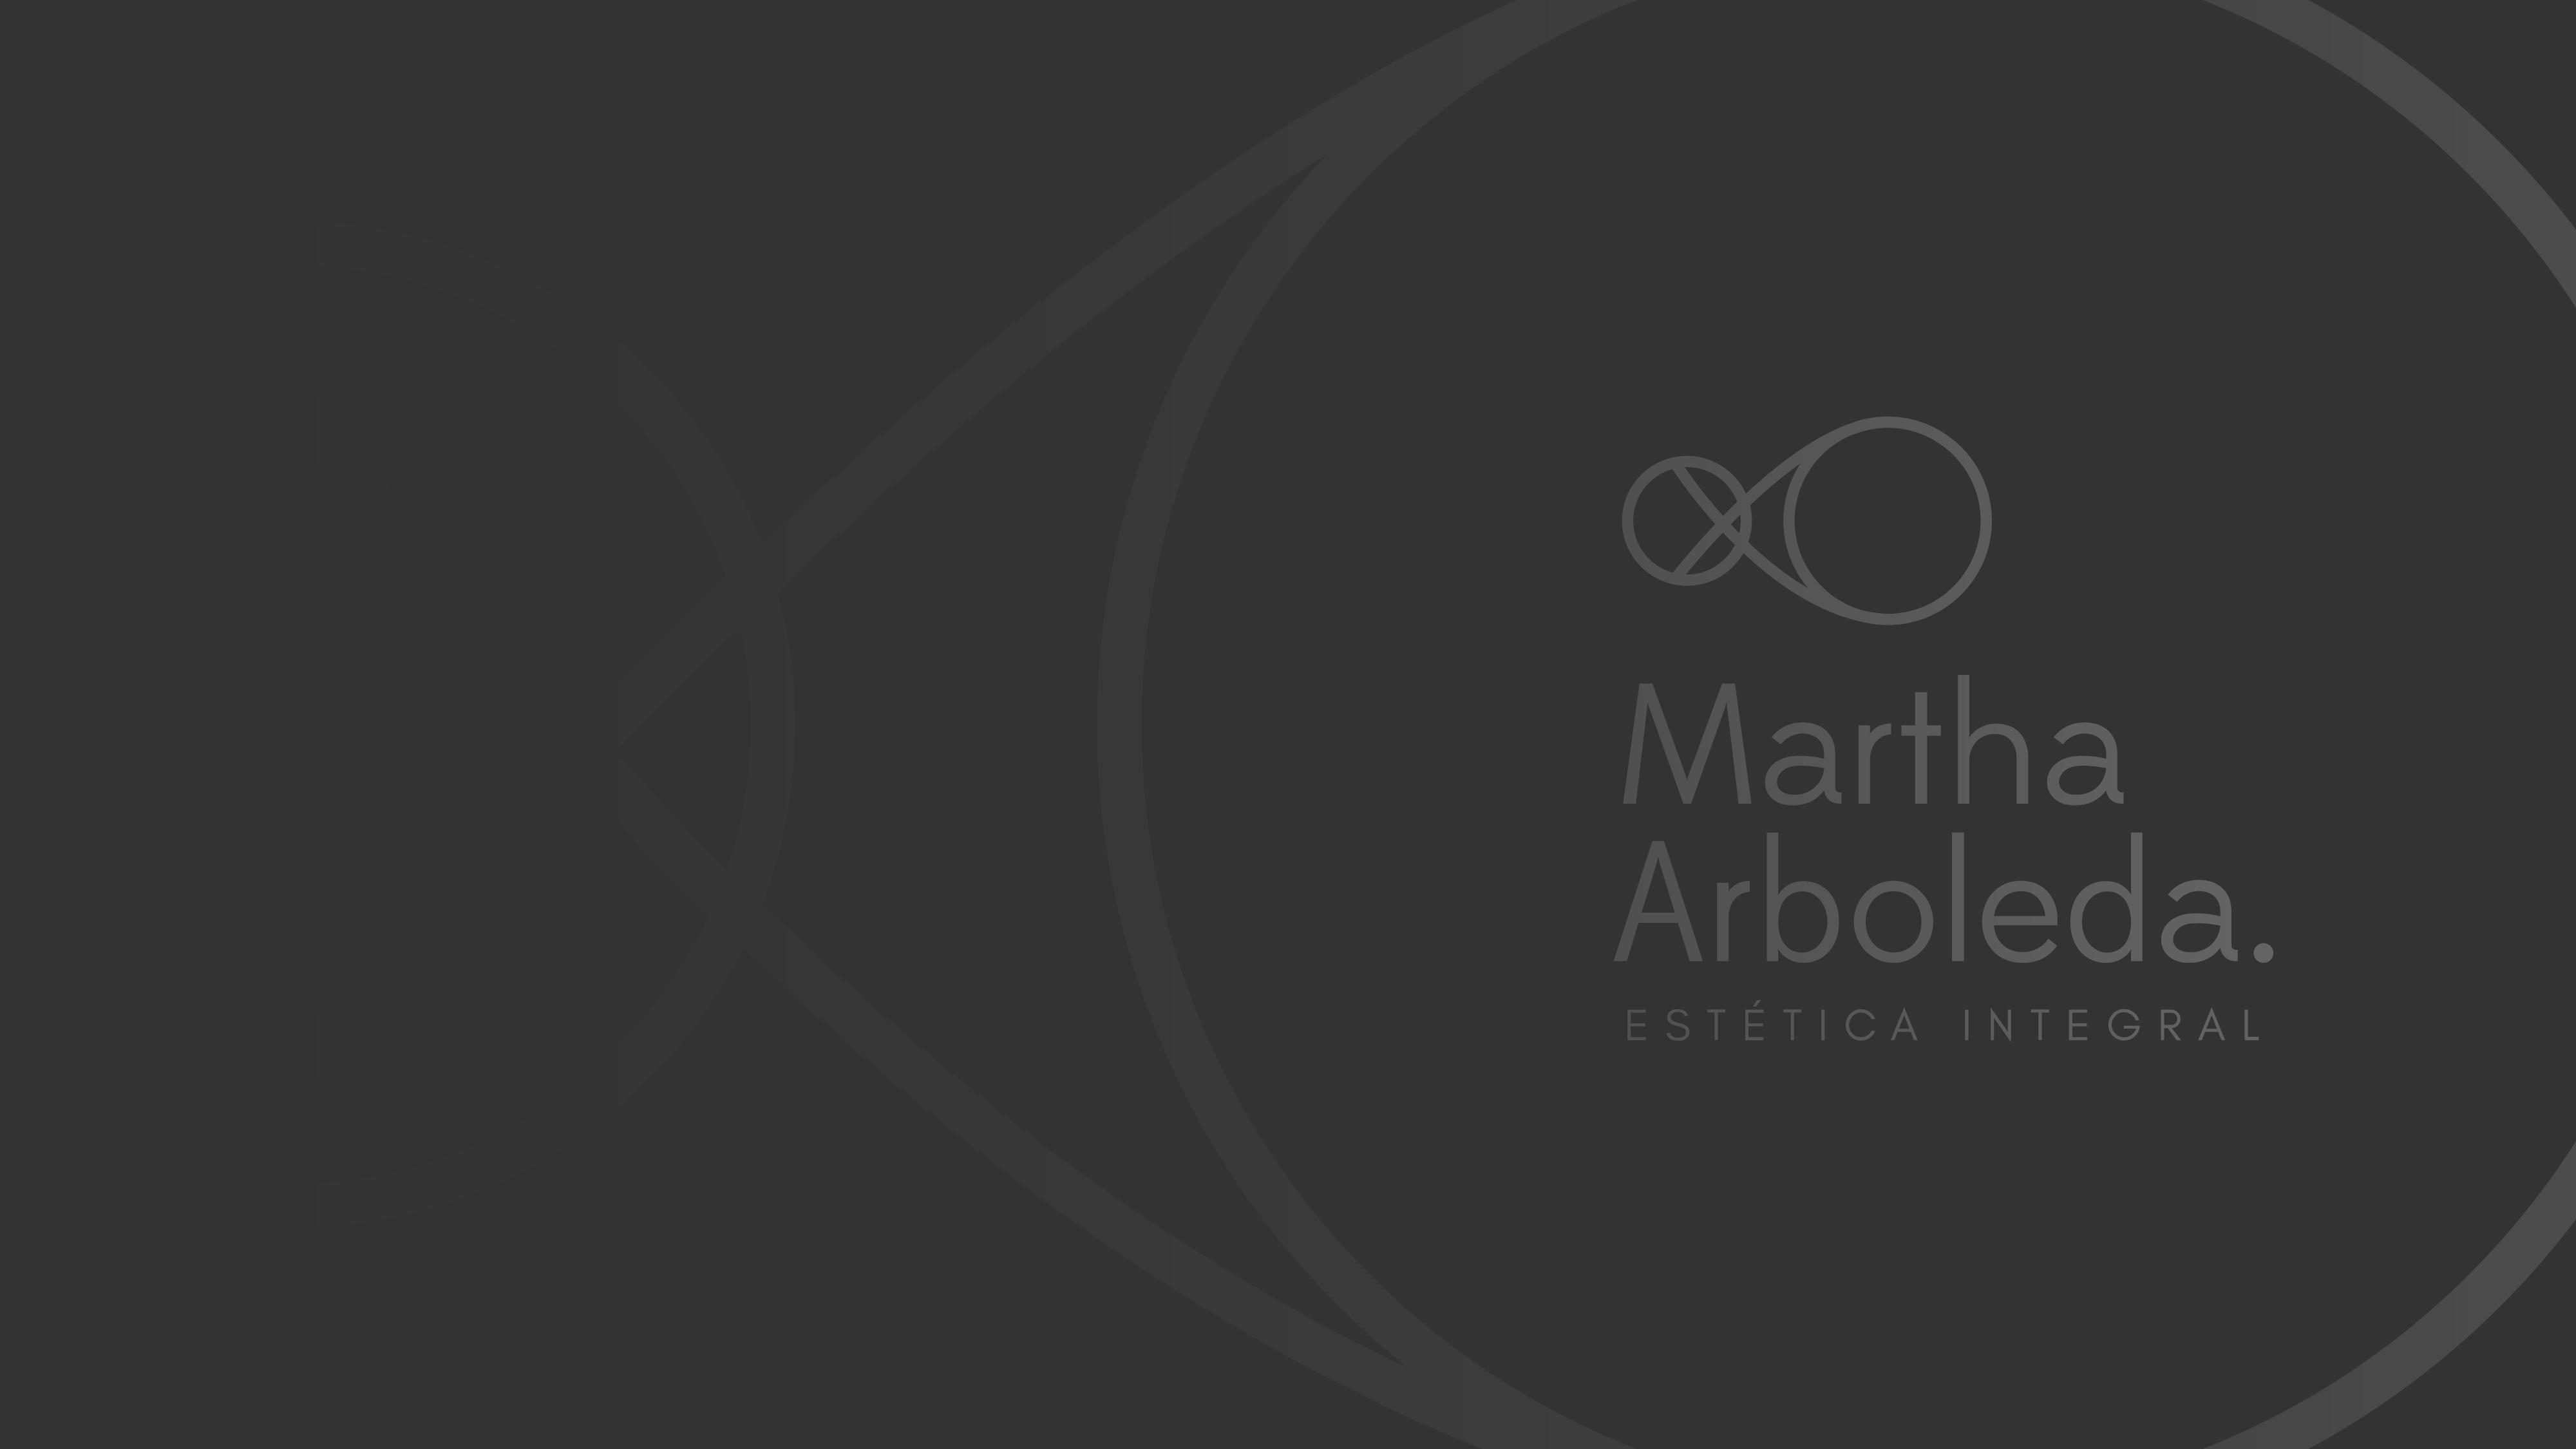 17_09_13_Identidad_Martha_Arboleda-13